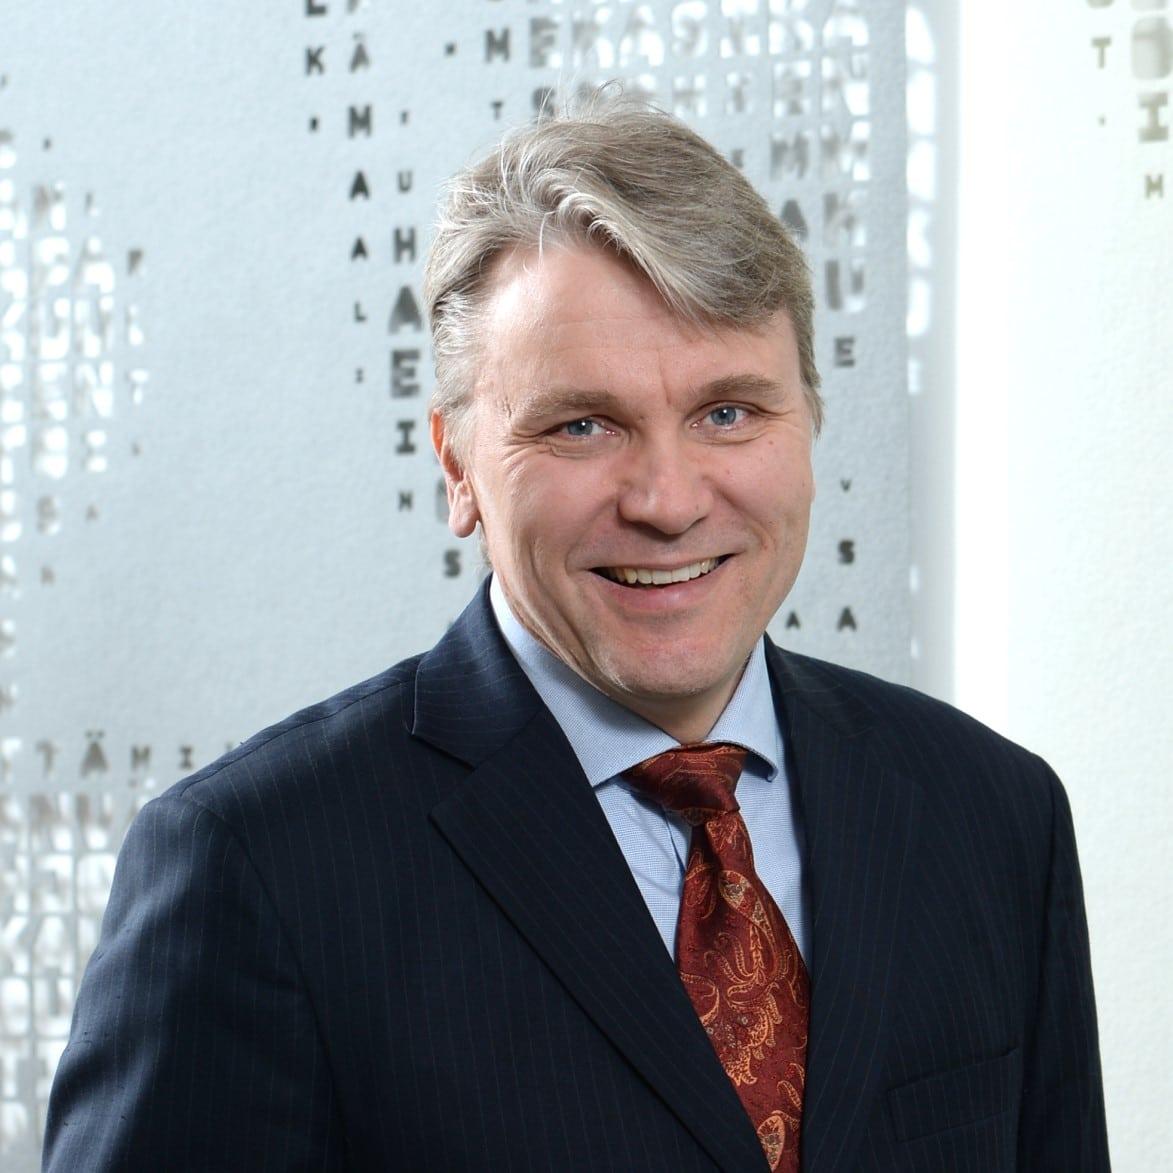 Markus Sihvonen